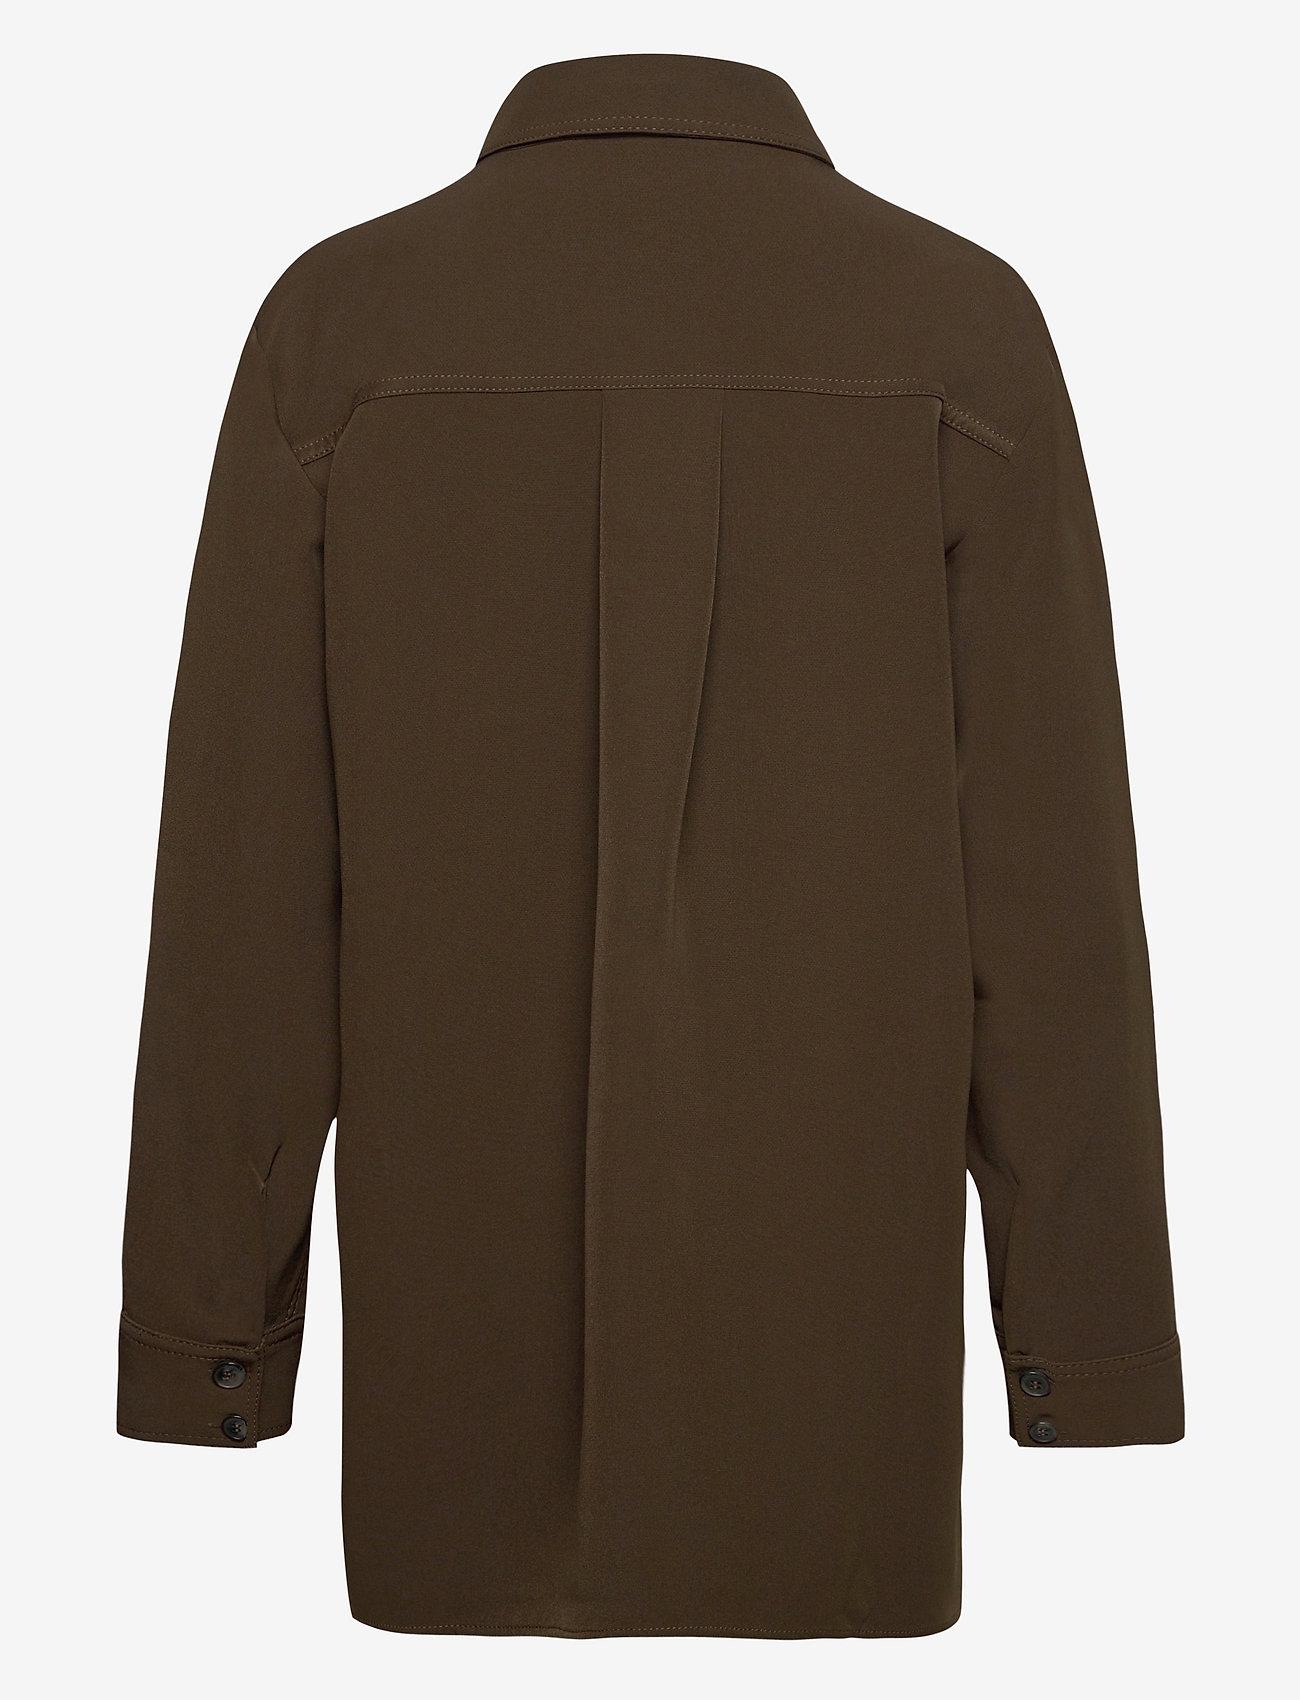 STINE GOYA - Shania, 1041 Solid Cady - kläder - cedar - 2